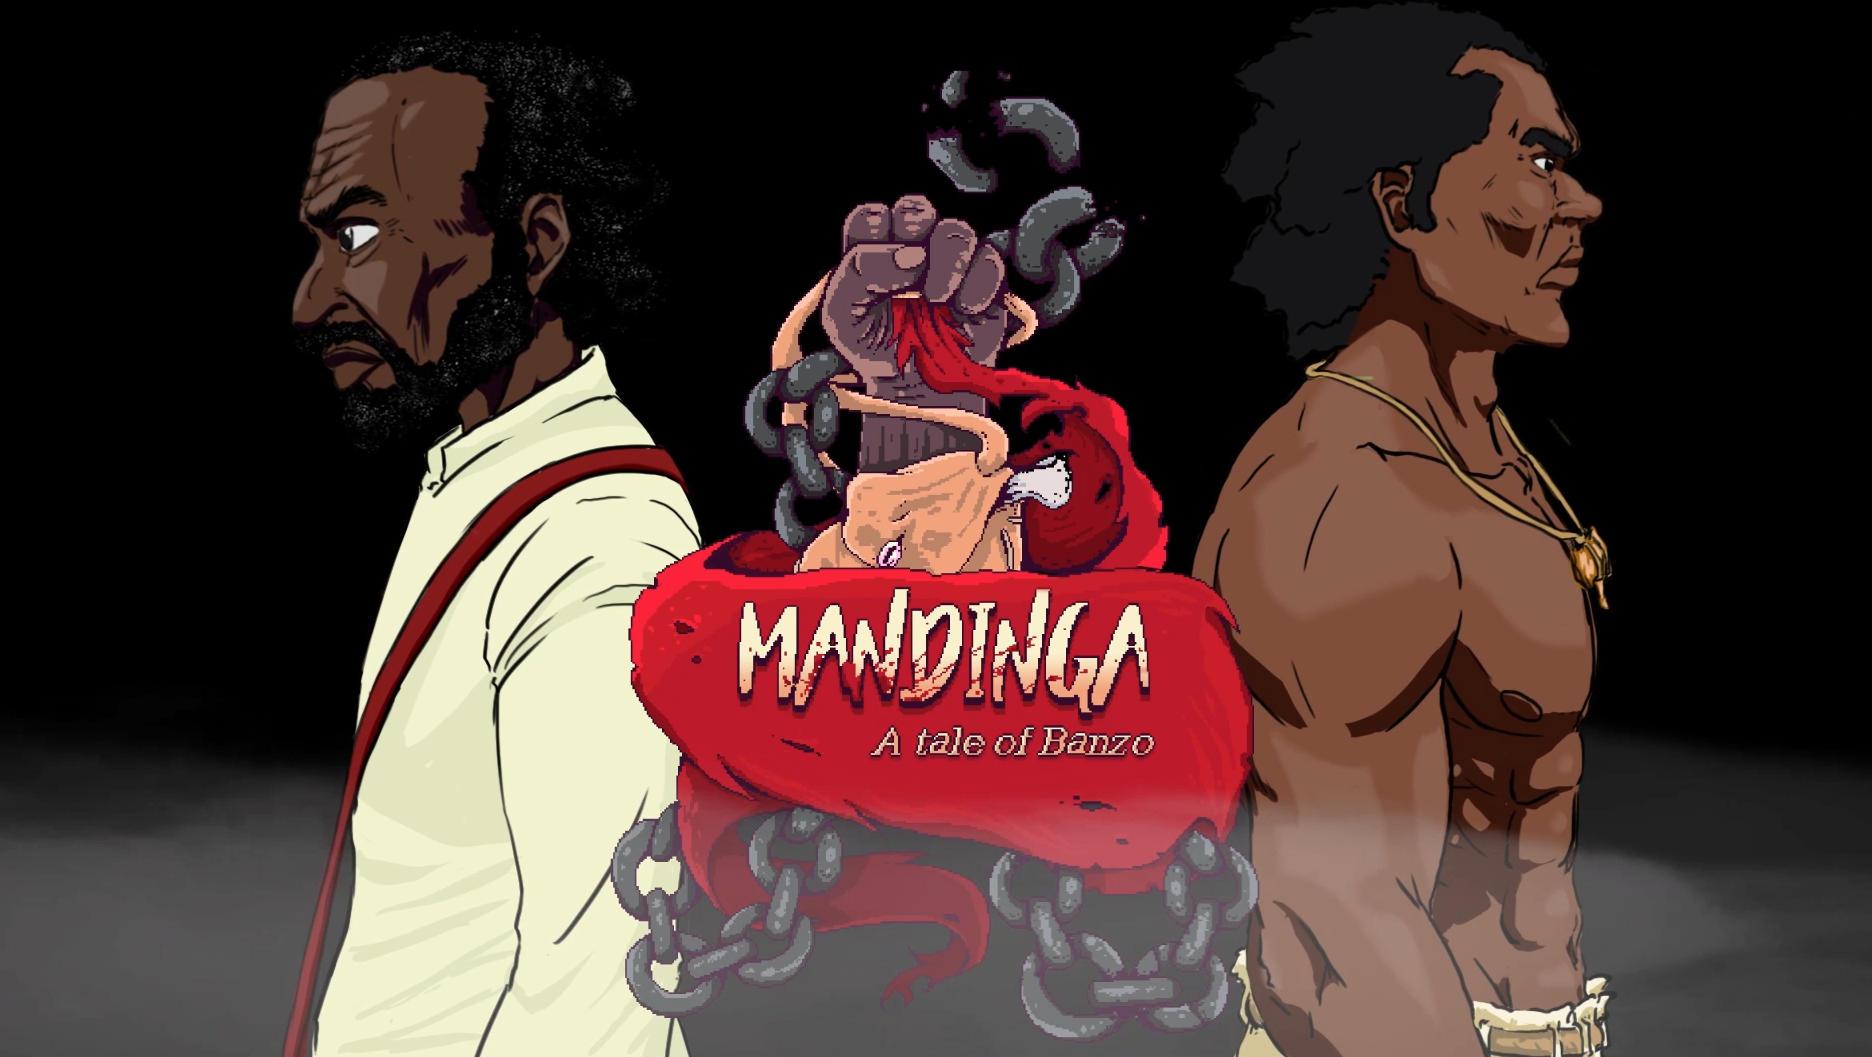 Mandinga - A Tale of Banzo Free Download